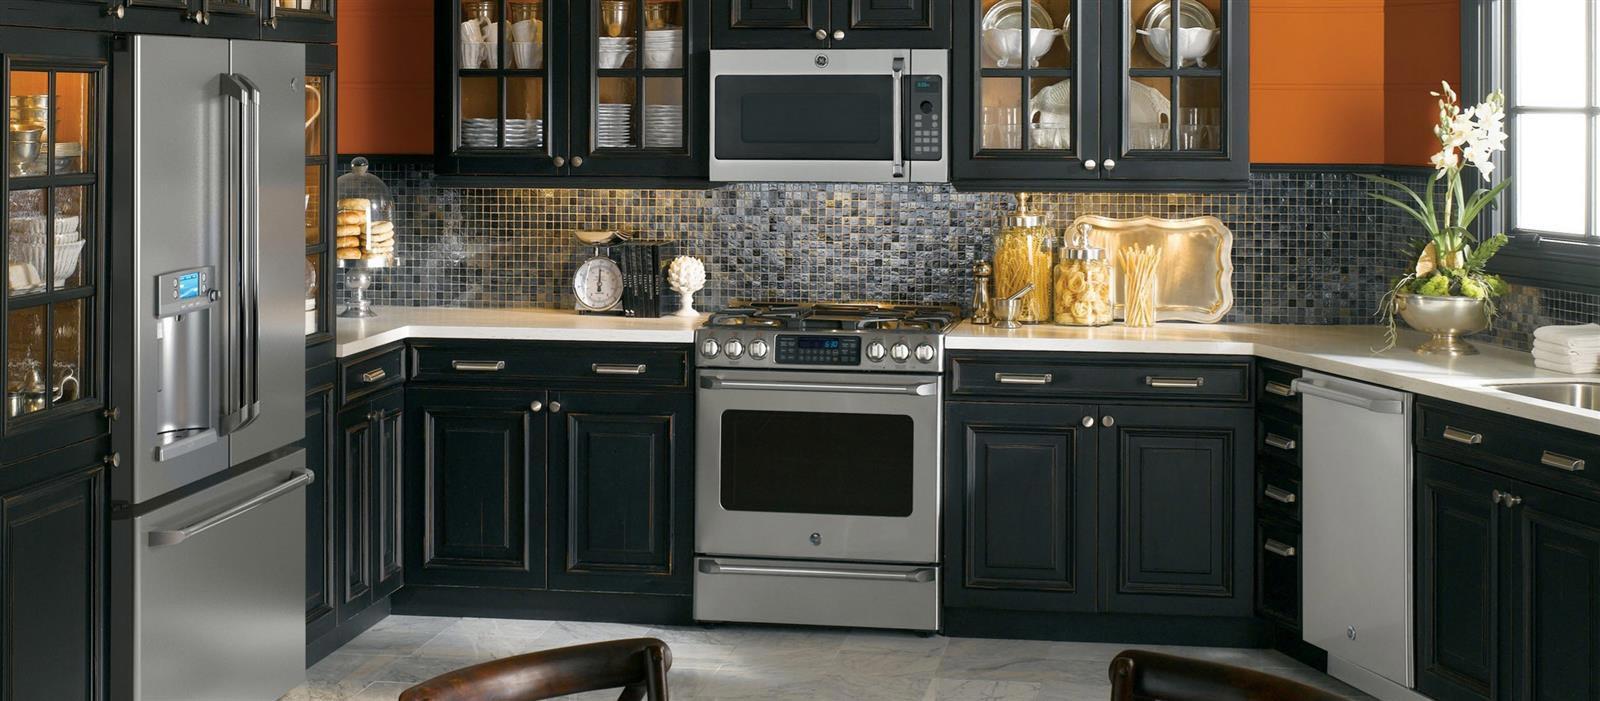 Kitchen Design Philadelphia Philadelphia Kitchen Design Purplebirdblog Kitchen Cabinets